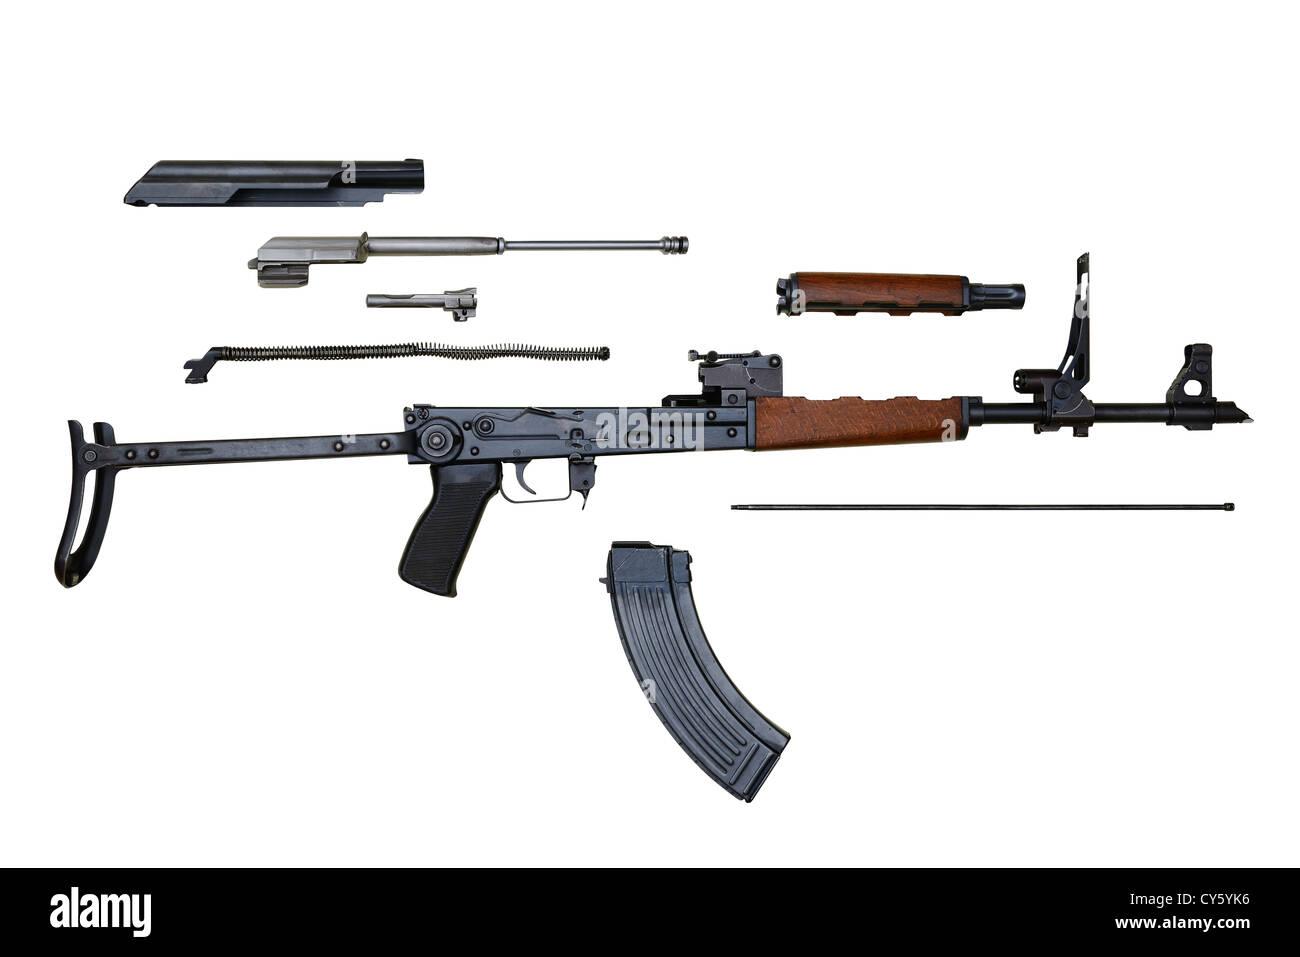 AK47 AKMS Kalashnikov Assault Rifle Stripped For Cleaning